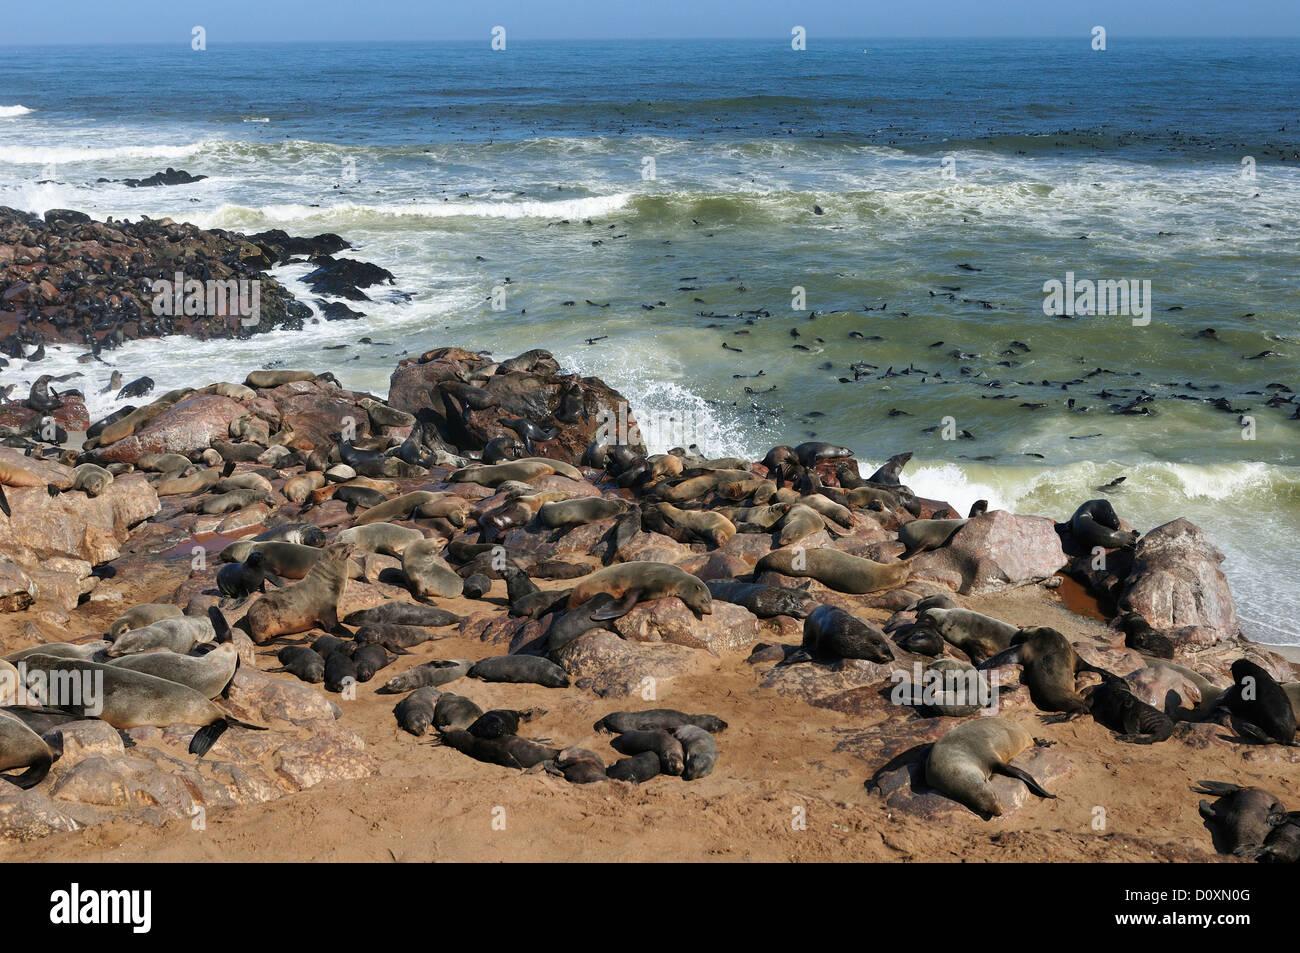 Africa, Cape Cross, Namibia, Seal Colony, Seals, animals, Skeleton Coast, beach, laying, mammal, ocean, sea lion, - Stock Image